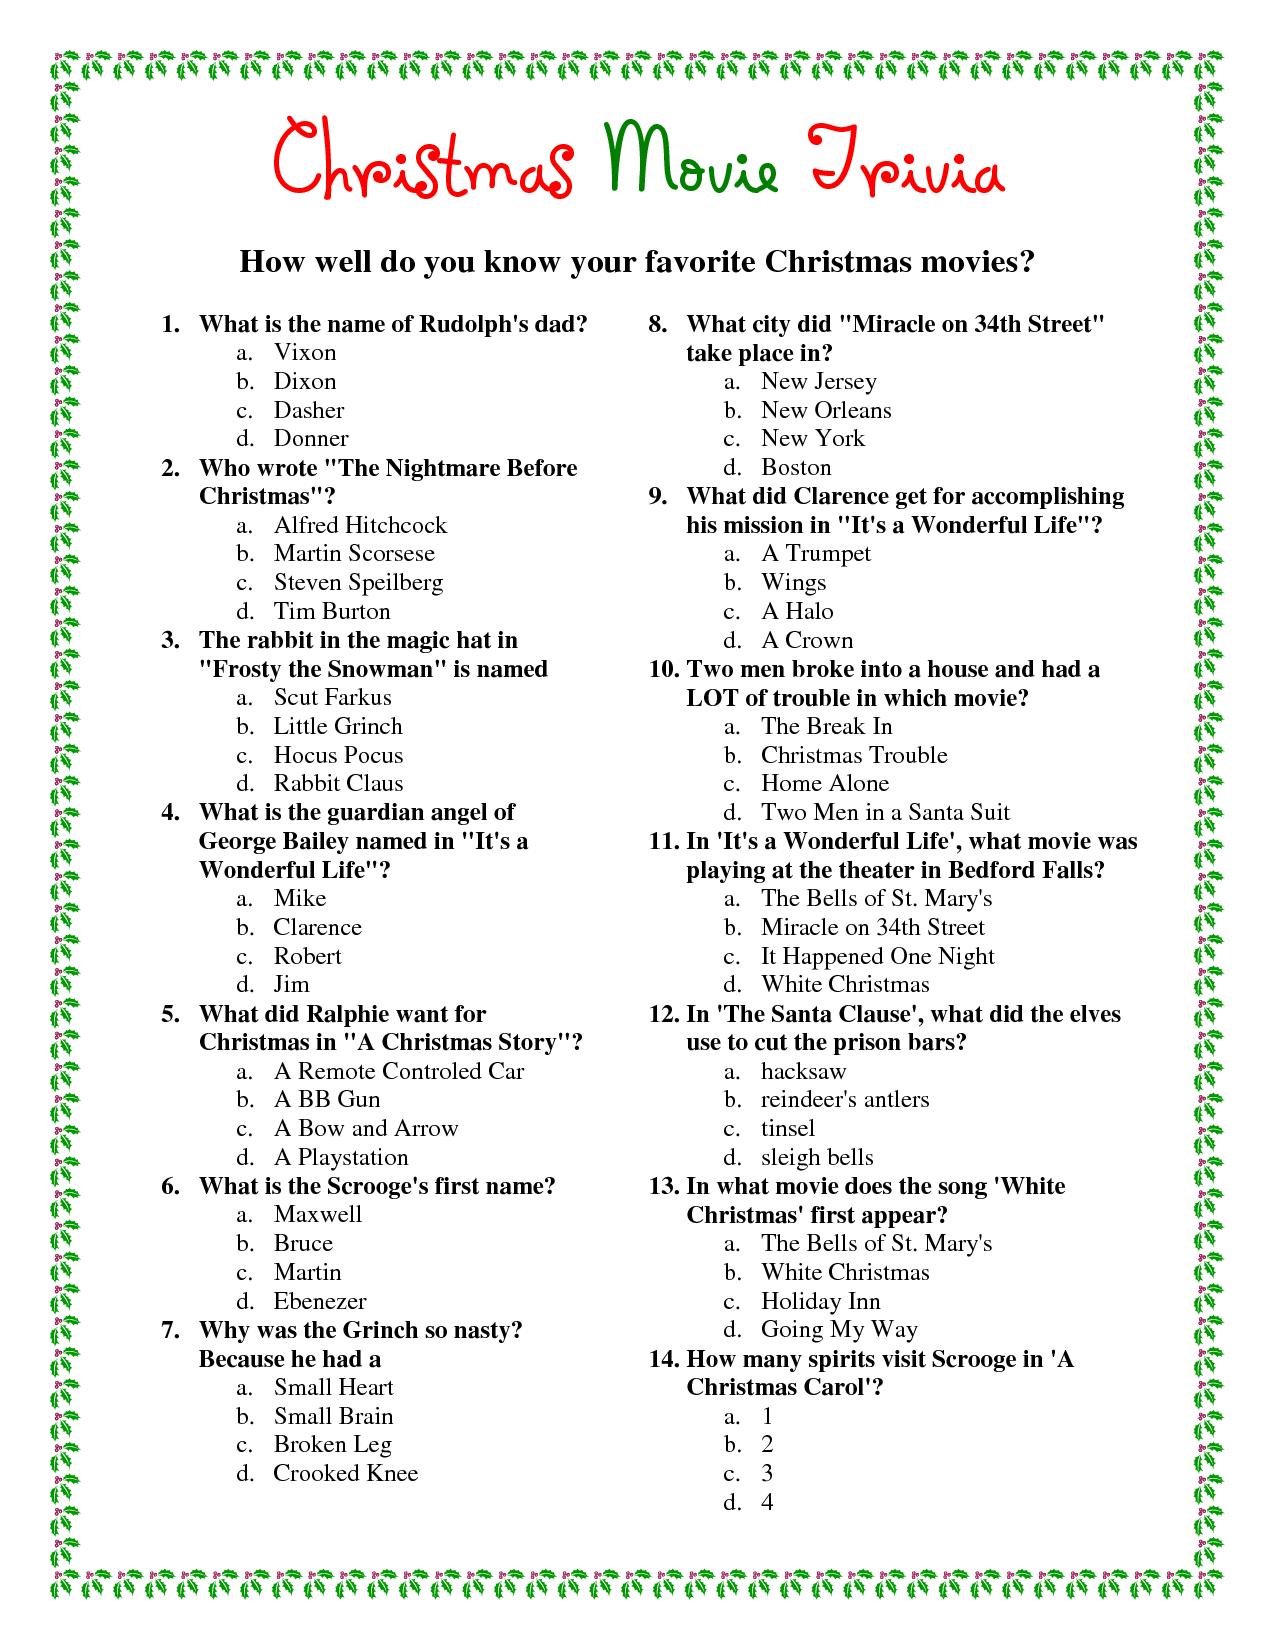 Printable Christmas Movie Trivia.pdf Download Legal Documents - Free Printable Trivia Questions For Seniors